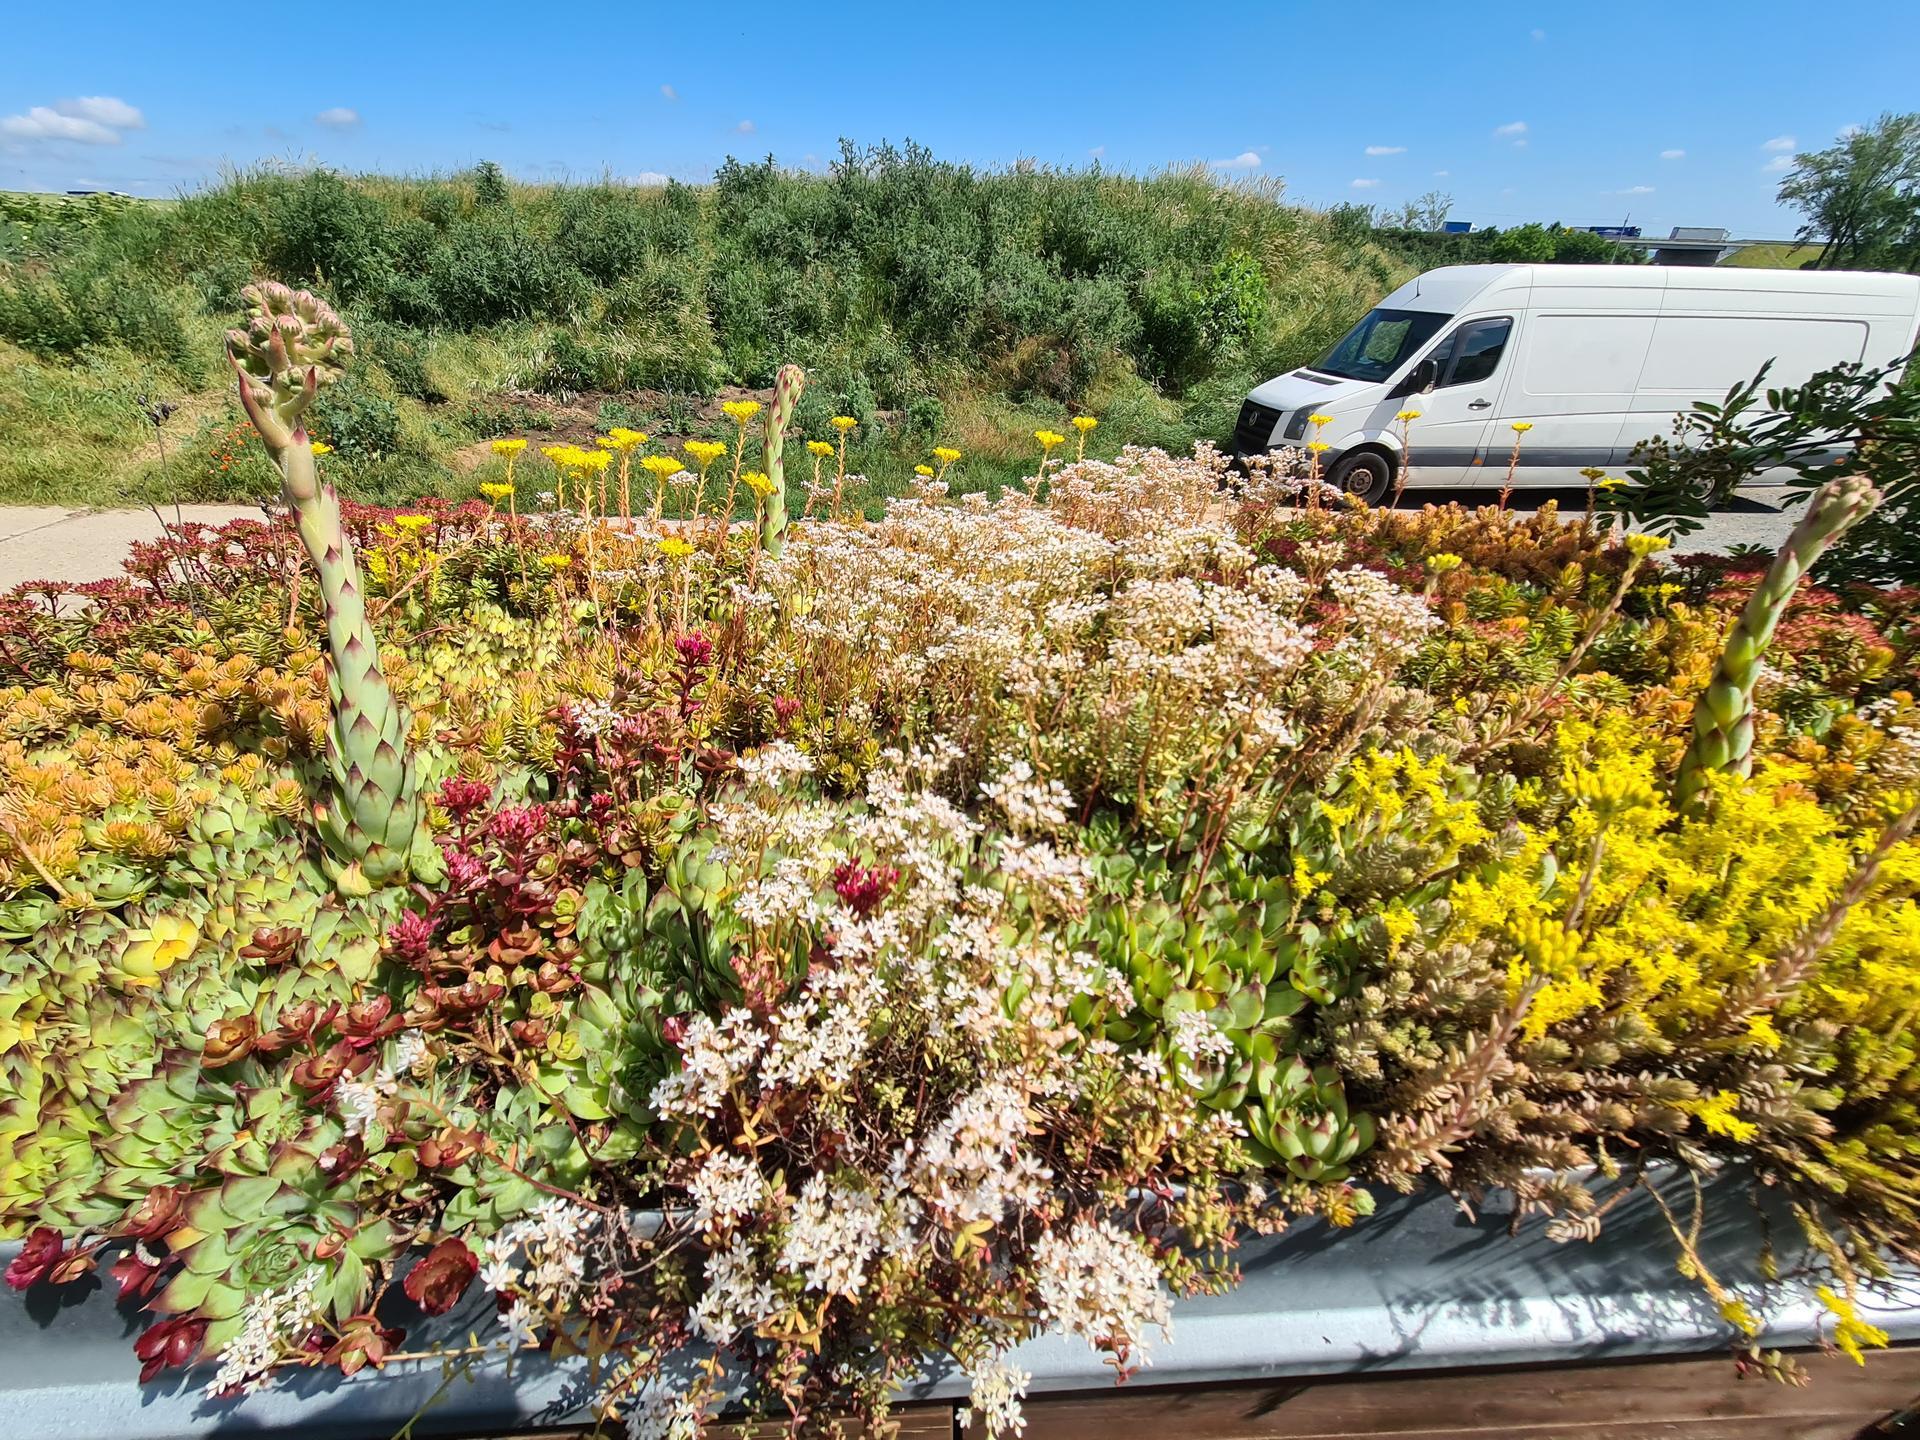 Naša záhradka 2021 - Zelena strecha vykvitla.